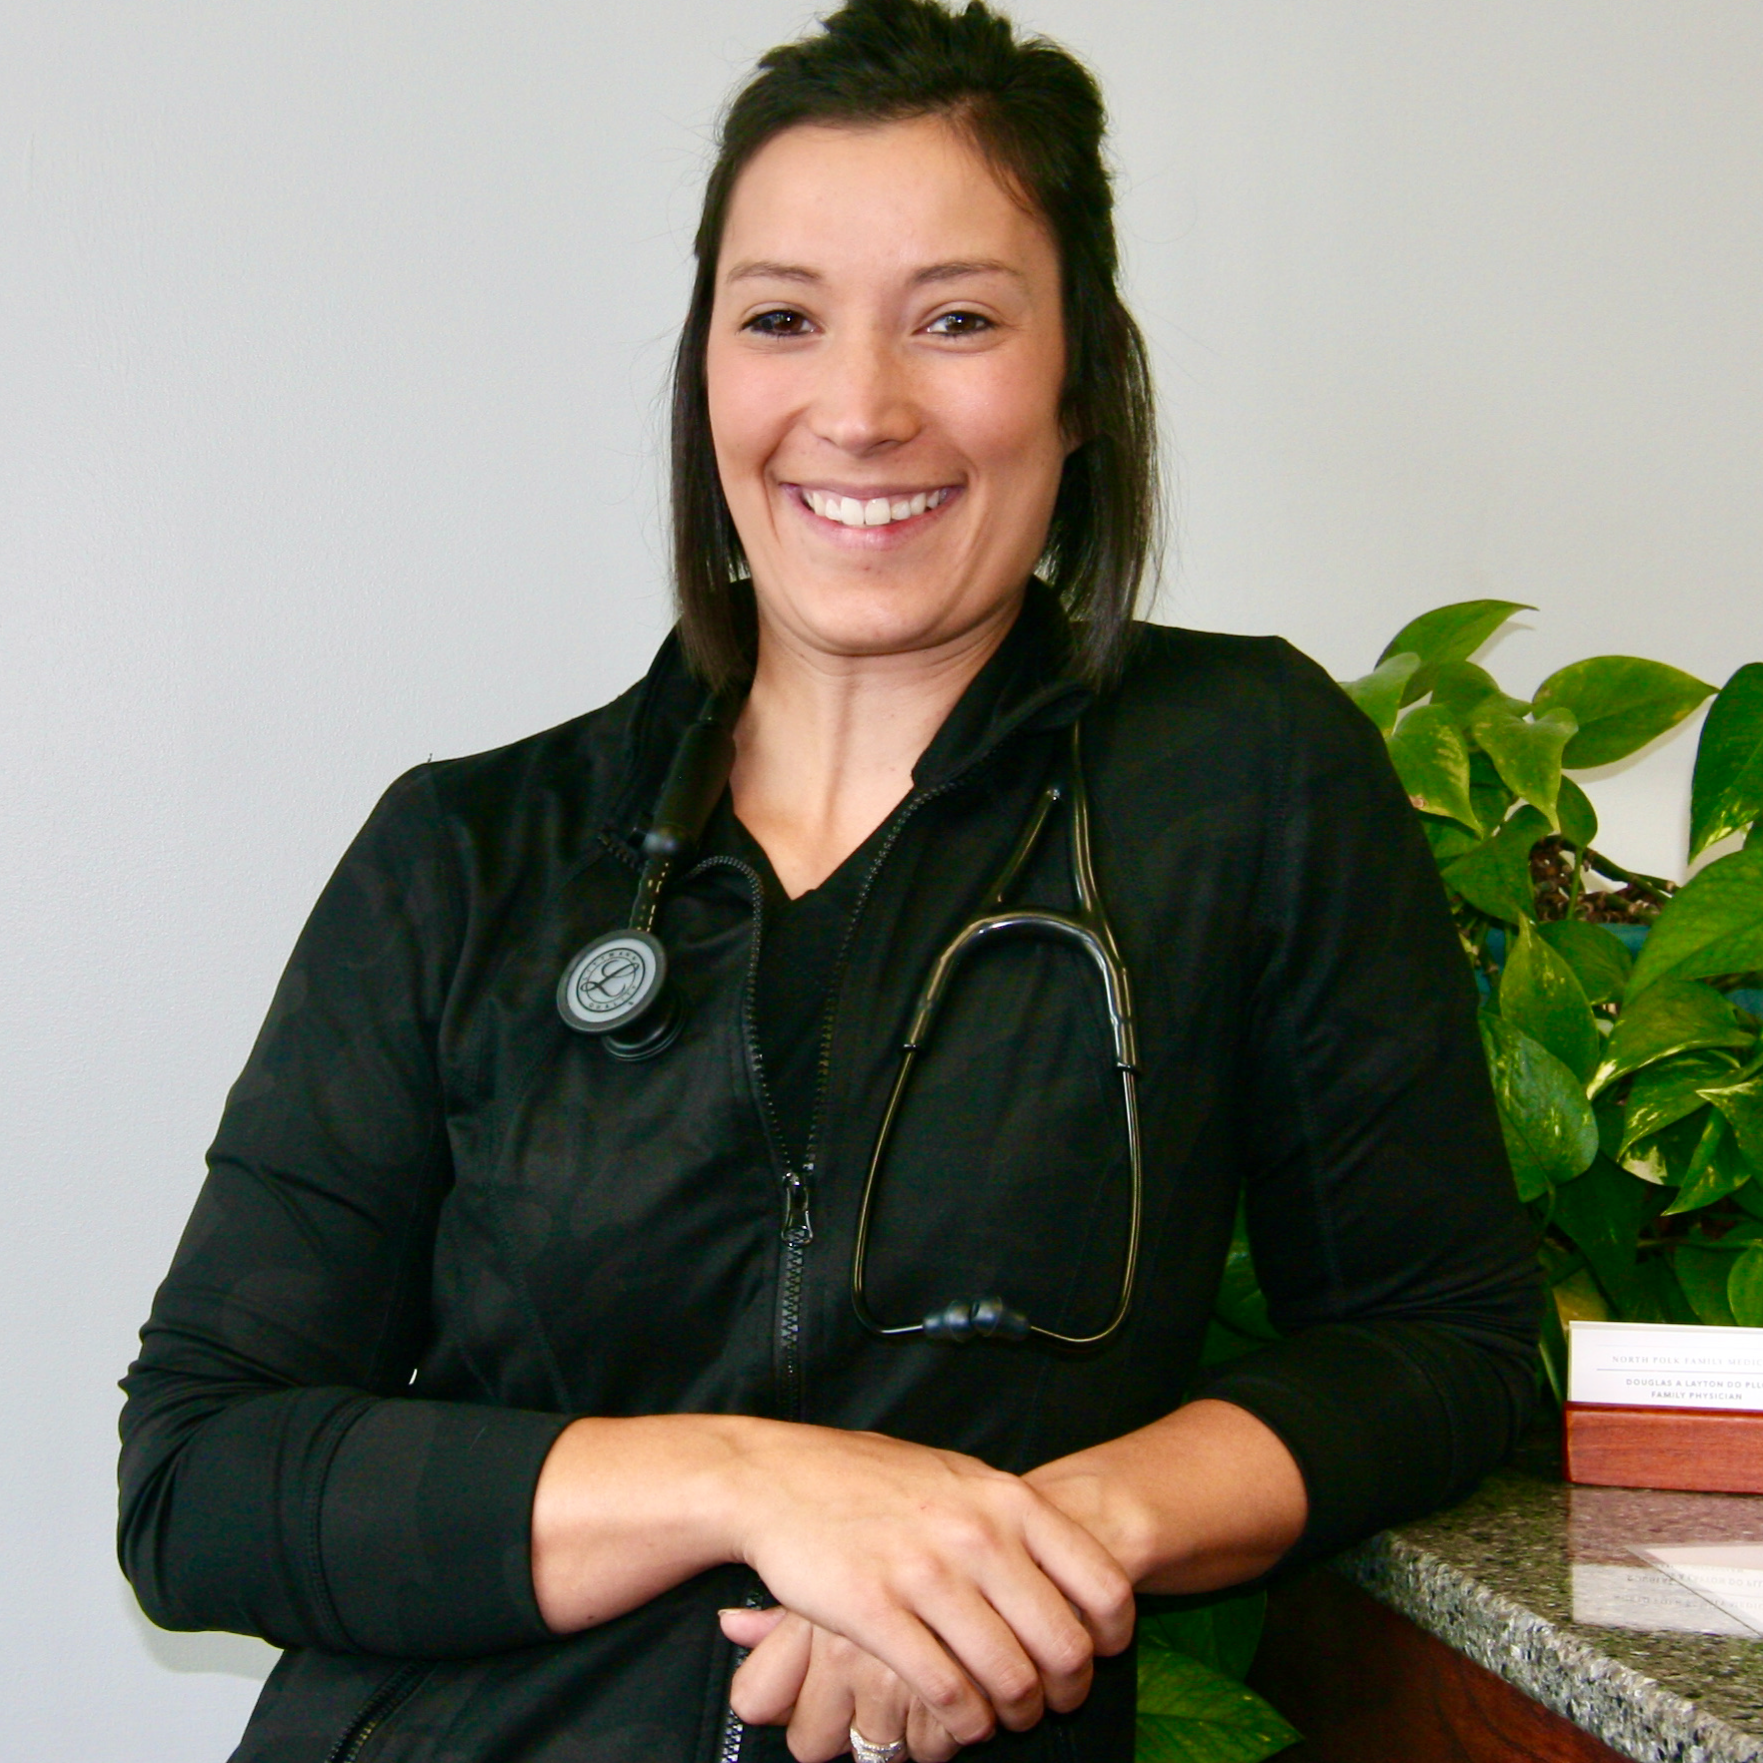 Jennifer Blaylock, RN, BSN